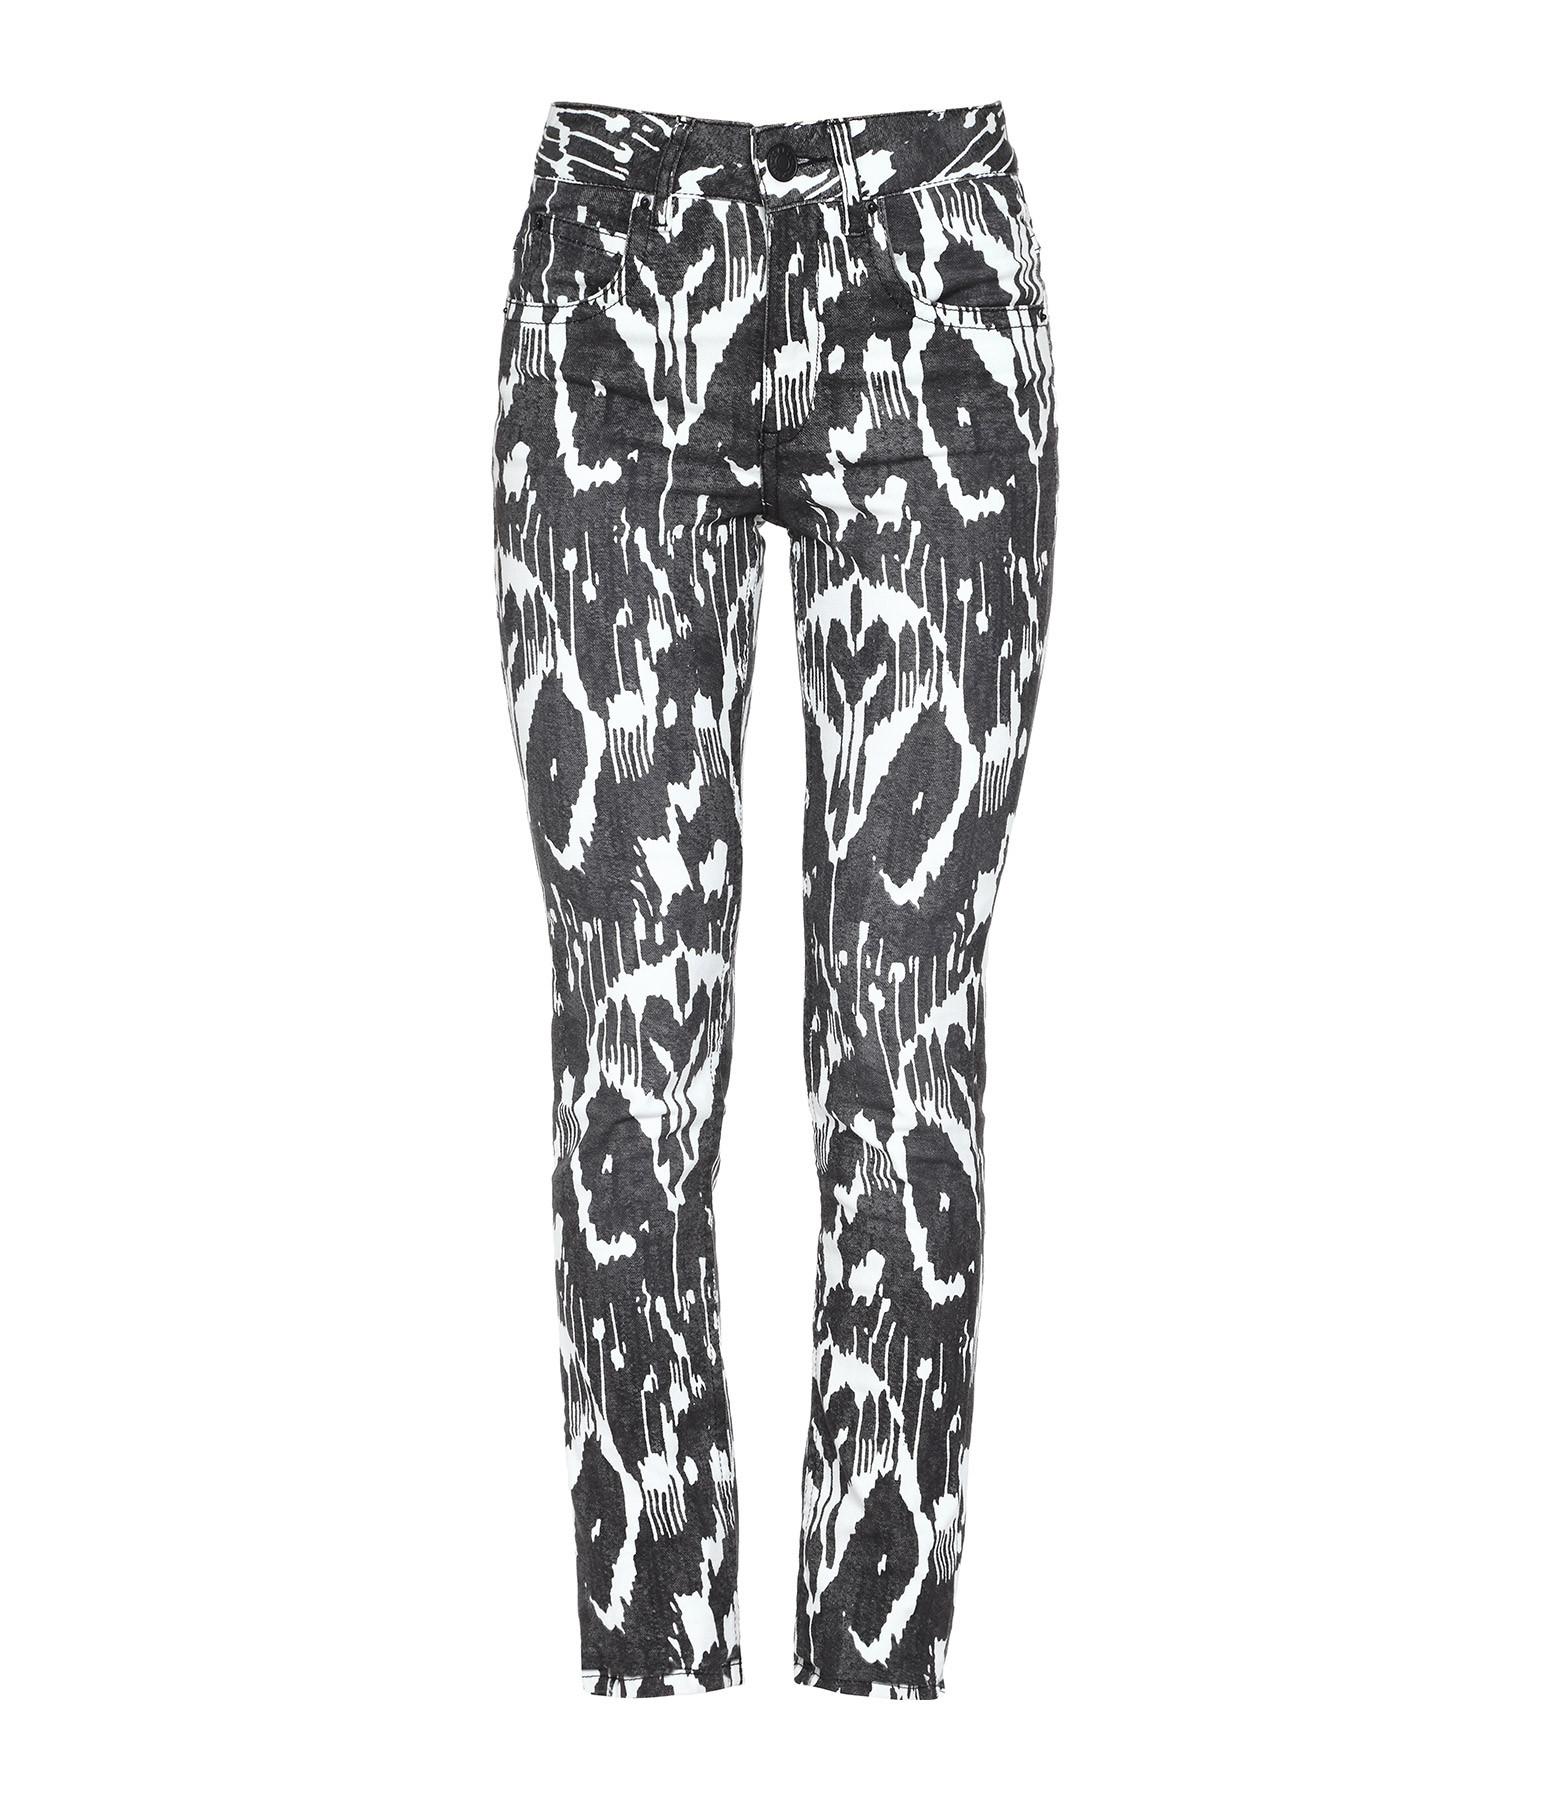 ISABEL MARANT ETOILE - Pantalon Paro Coton Noir